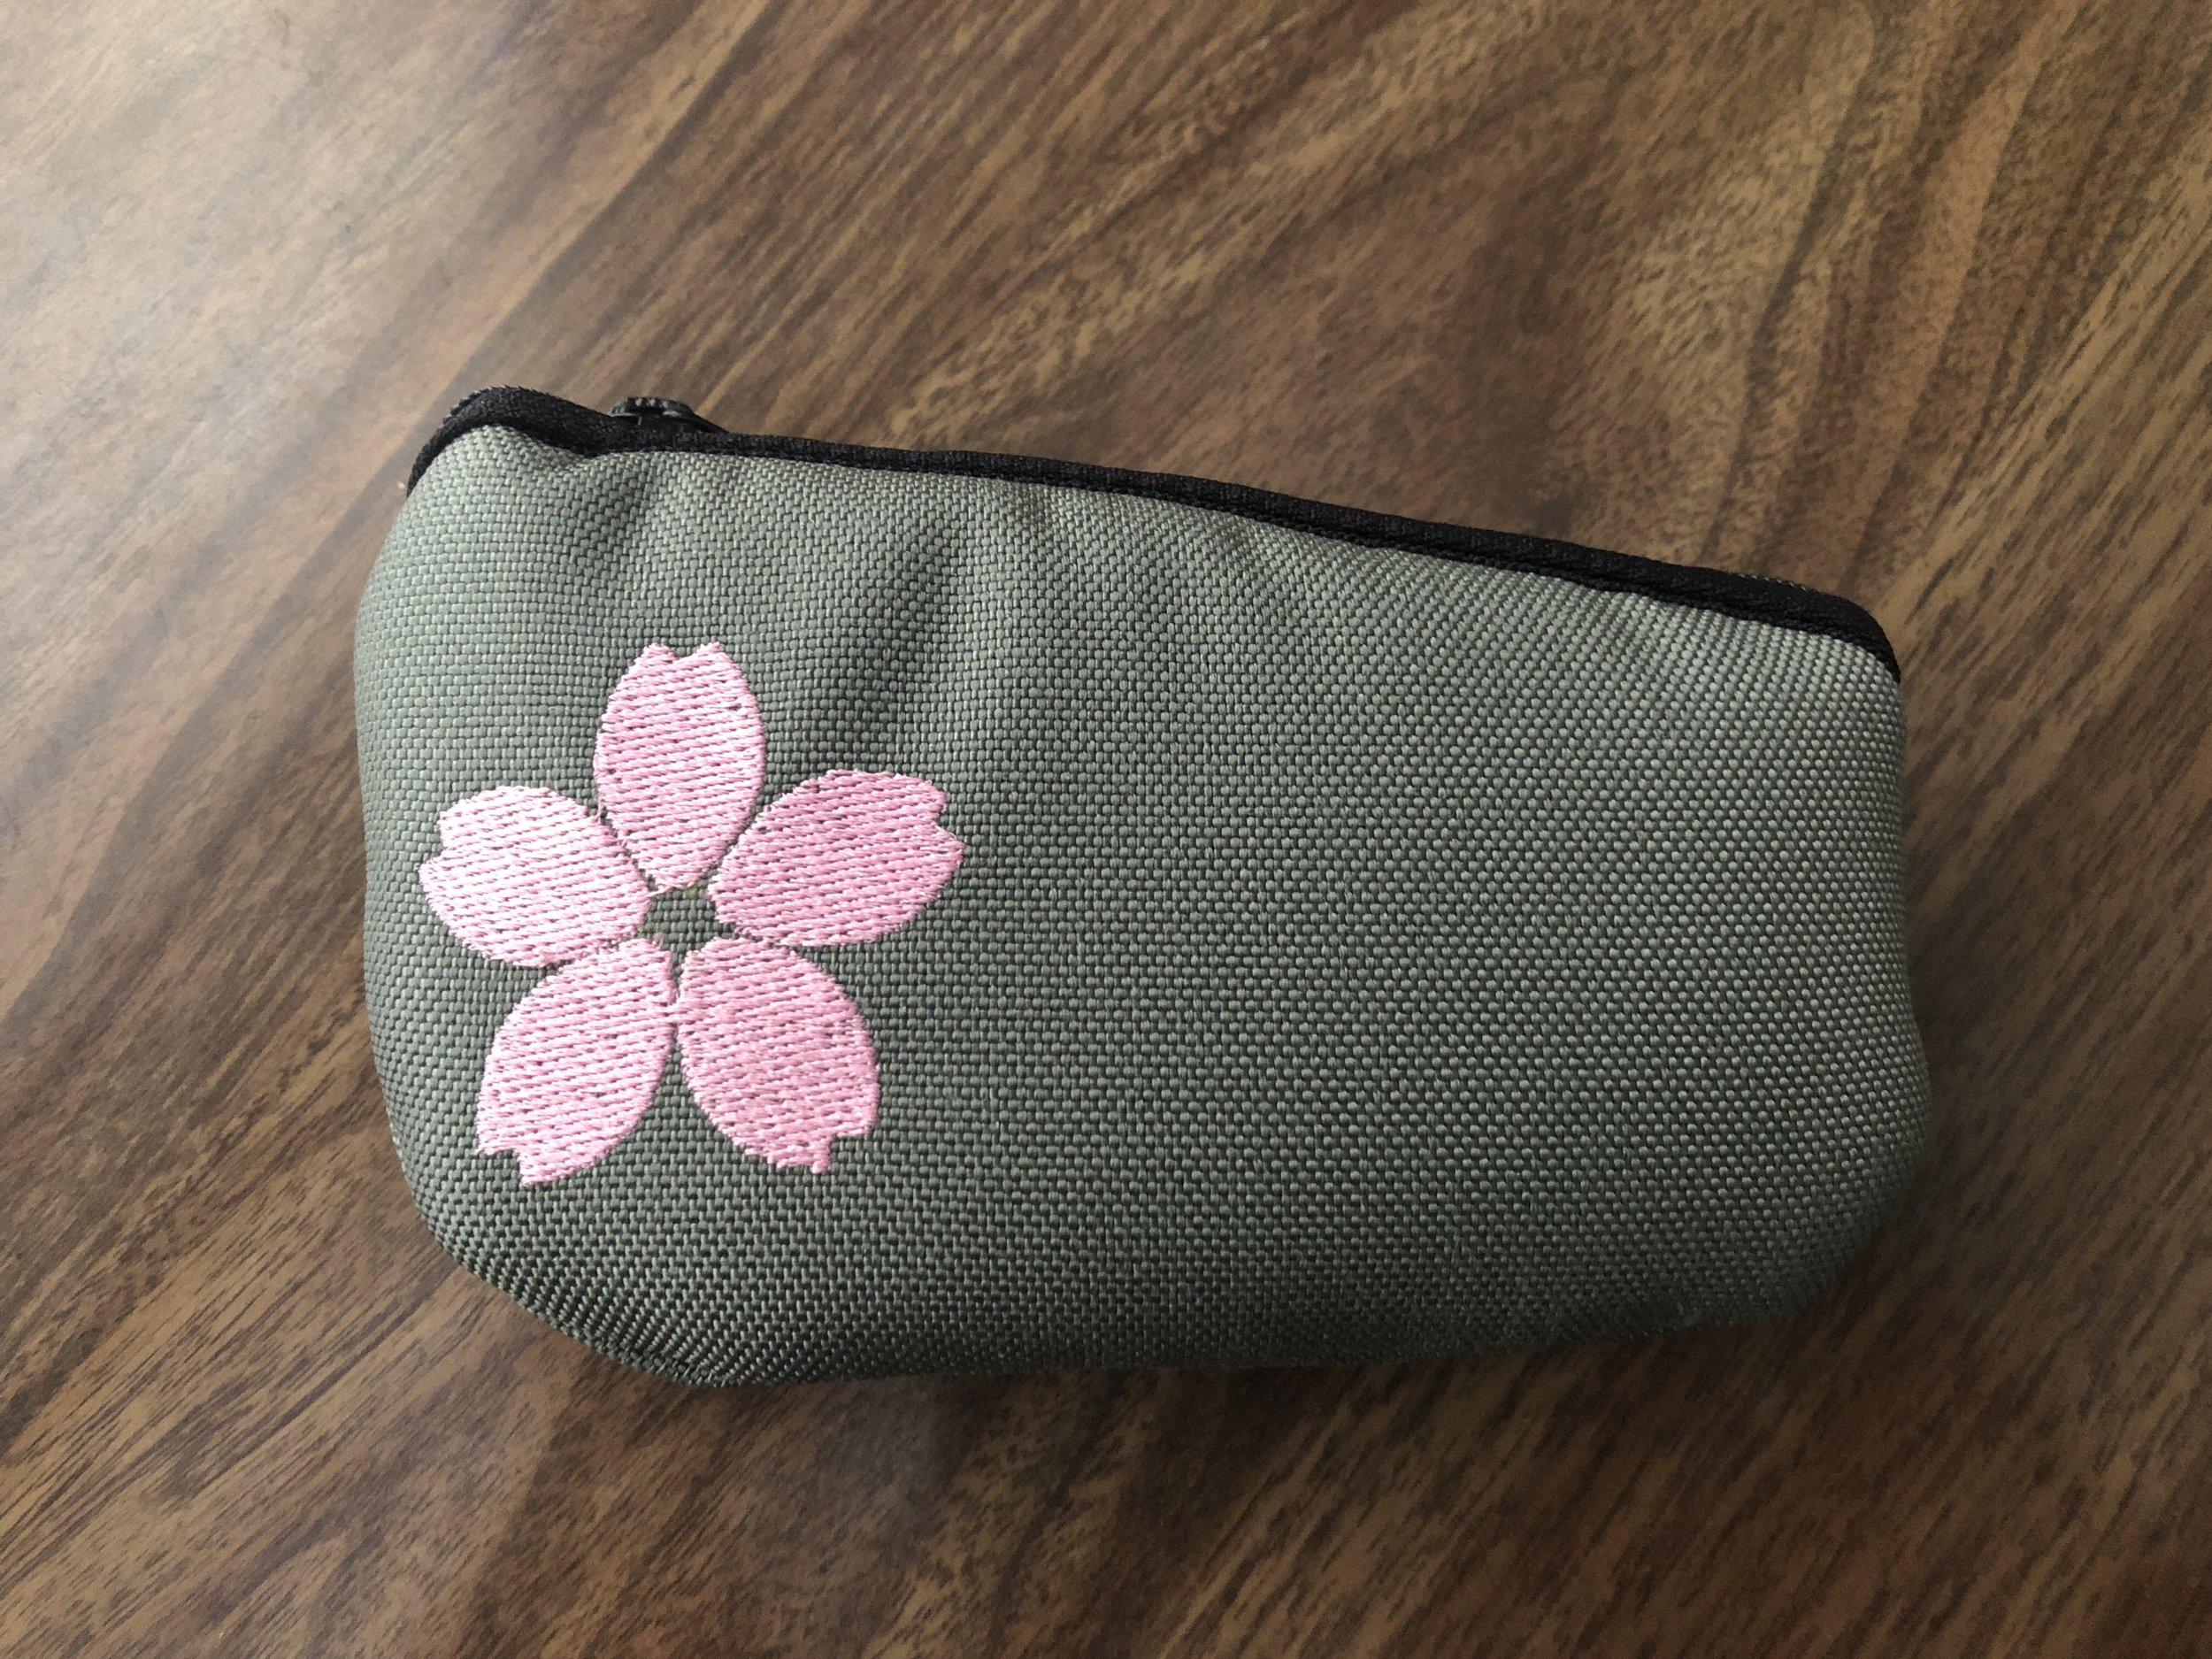 Cherry-blossom-pouch.jpg